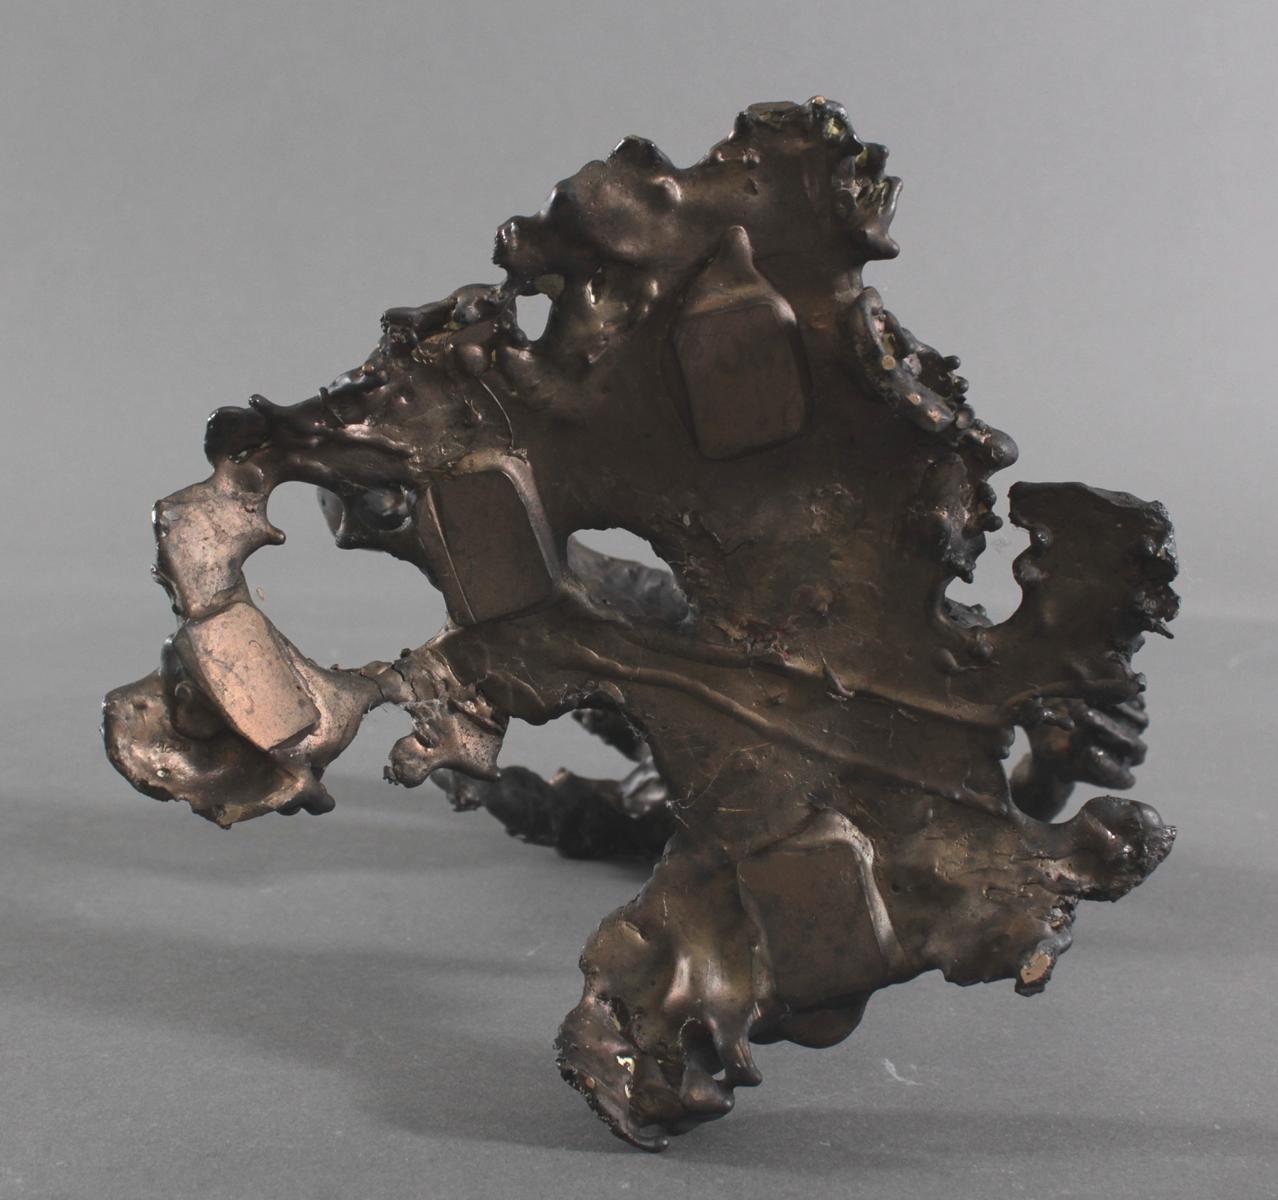 Abstrakte Bronzeskulptur 'Giesser', 2. Hälfte 20. Jh.-5